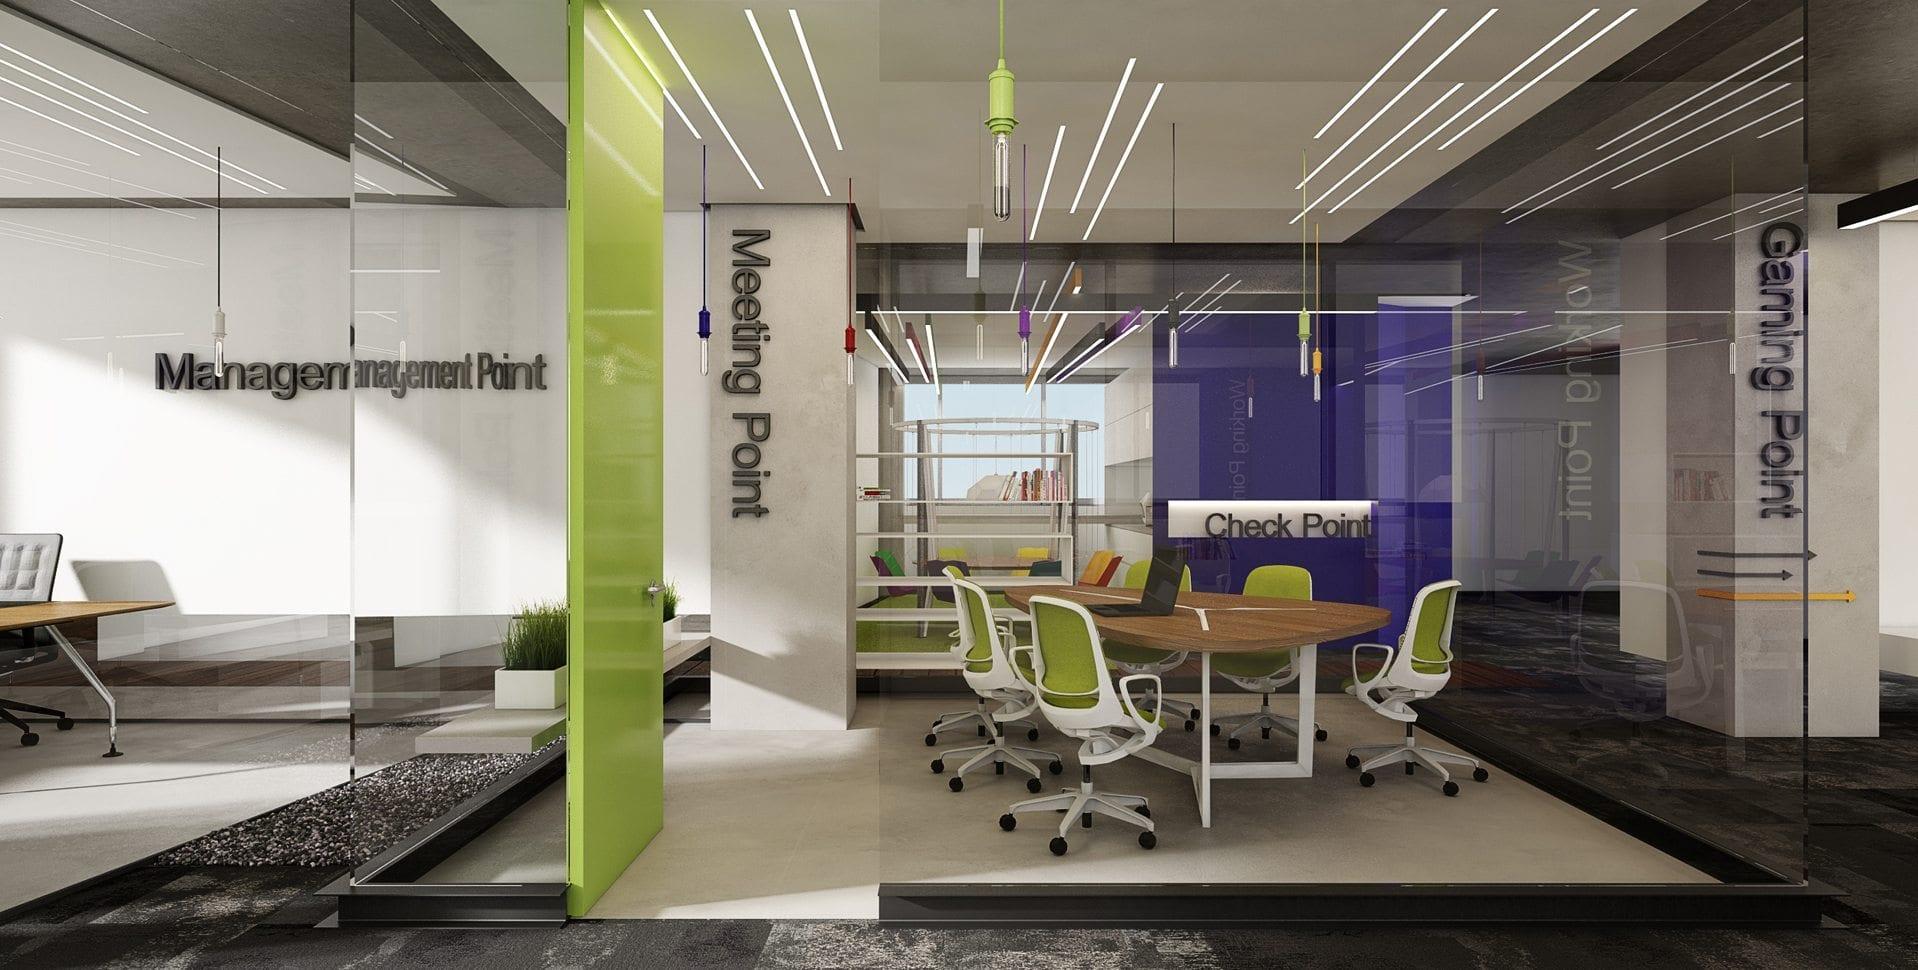 Maayan-Golan_Architectural-Visualization_ office-interior-visualization_meetin-room_check-point-milan_architect-dunsky-architects_03